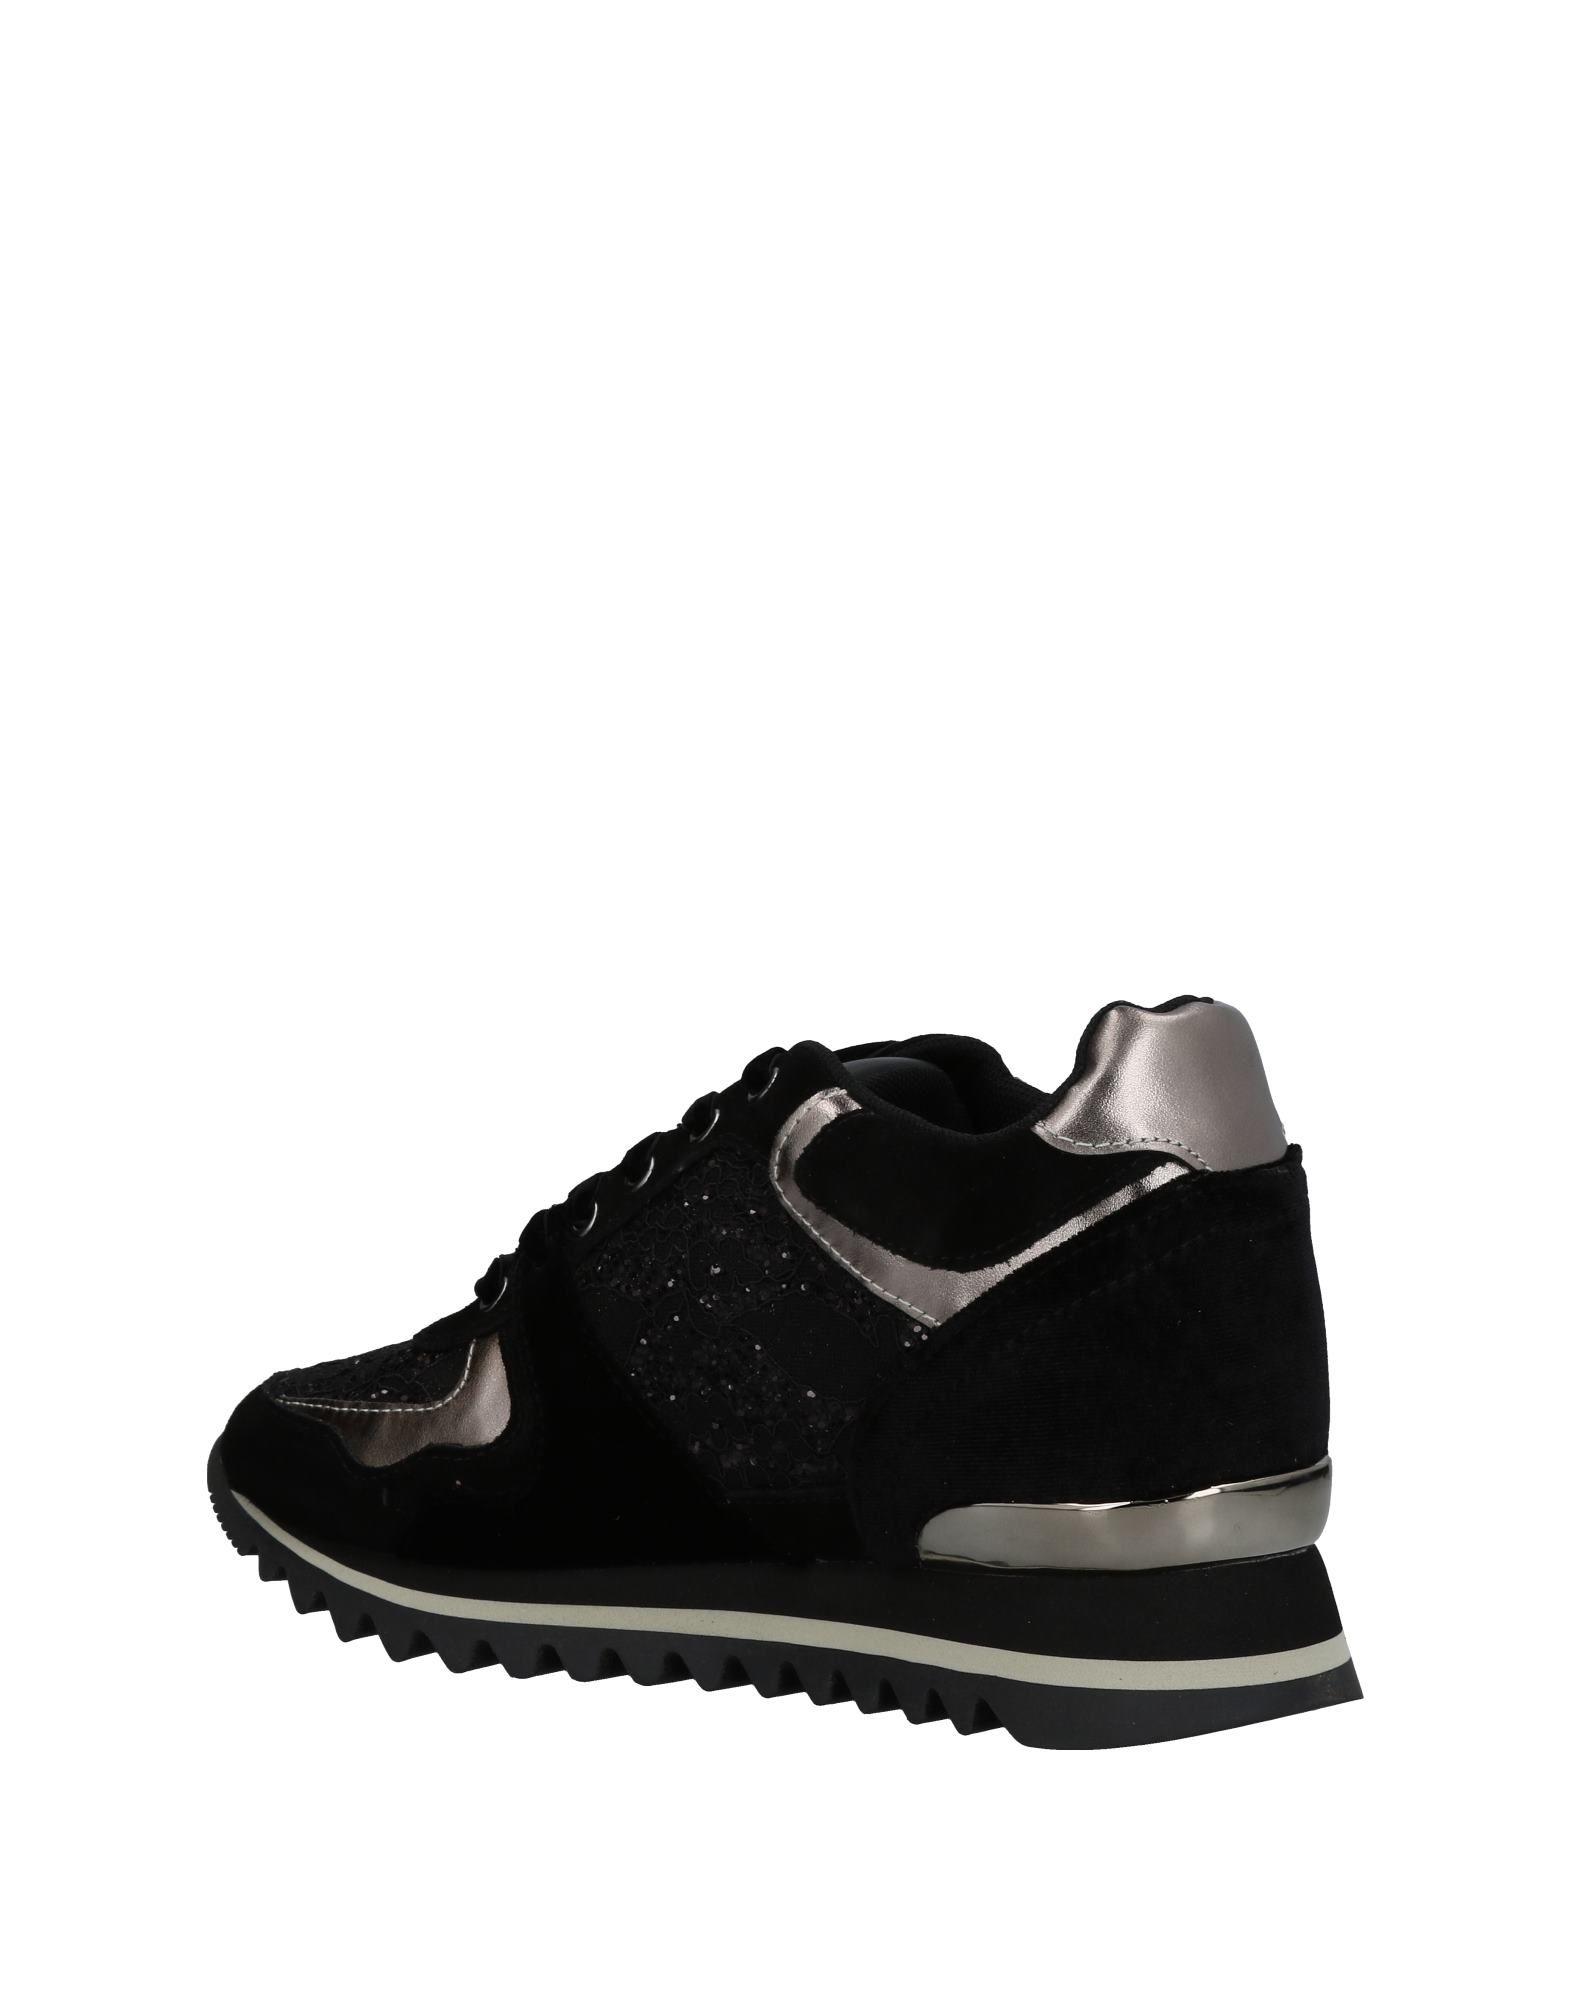 Haltbare Mode 11456242NR billige Schuhe Gioseppo Sneakers Damen  11456242NR Mode Heiße Schuhe 08d5a5